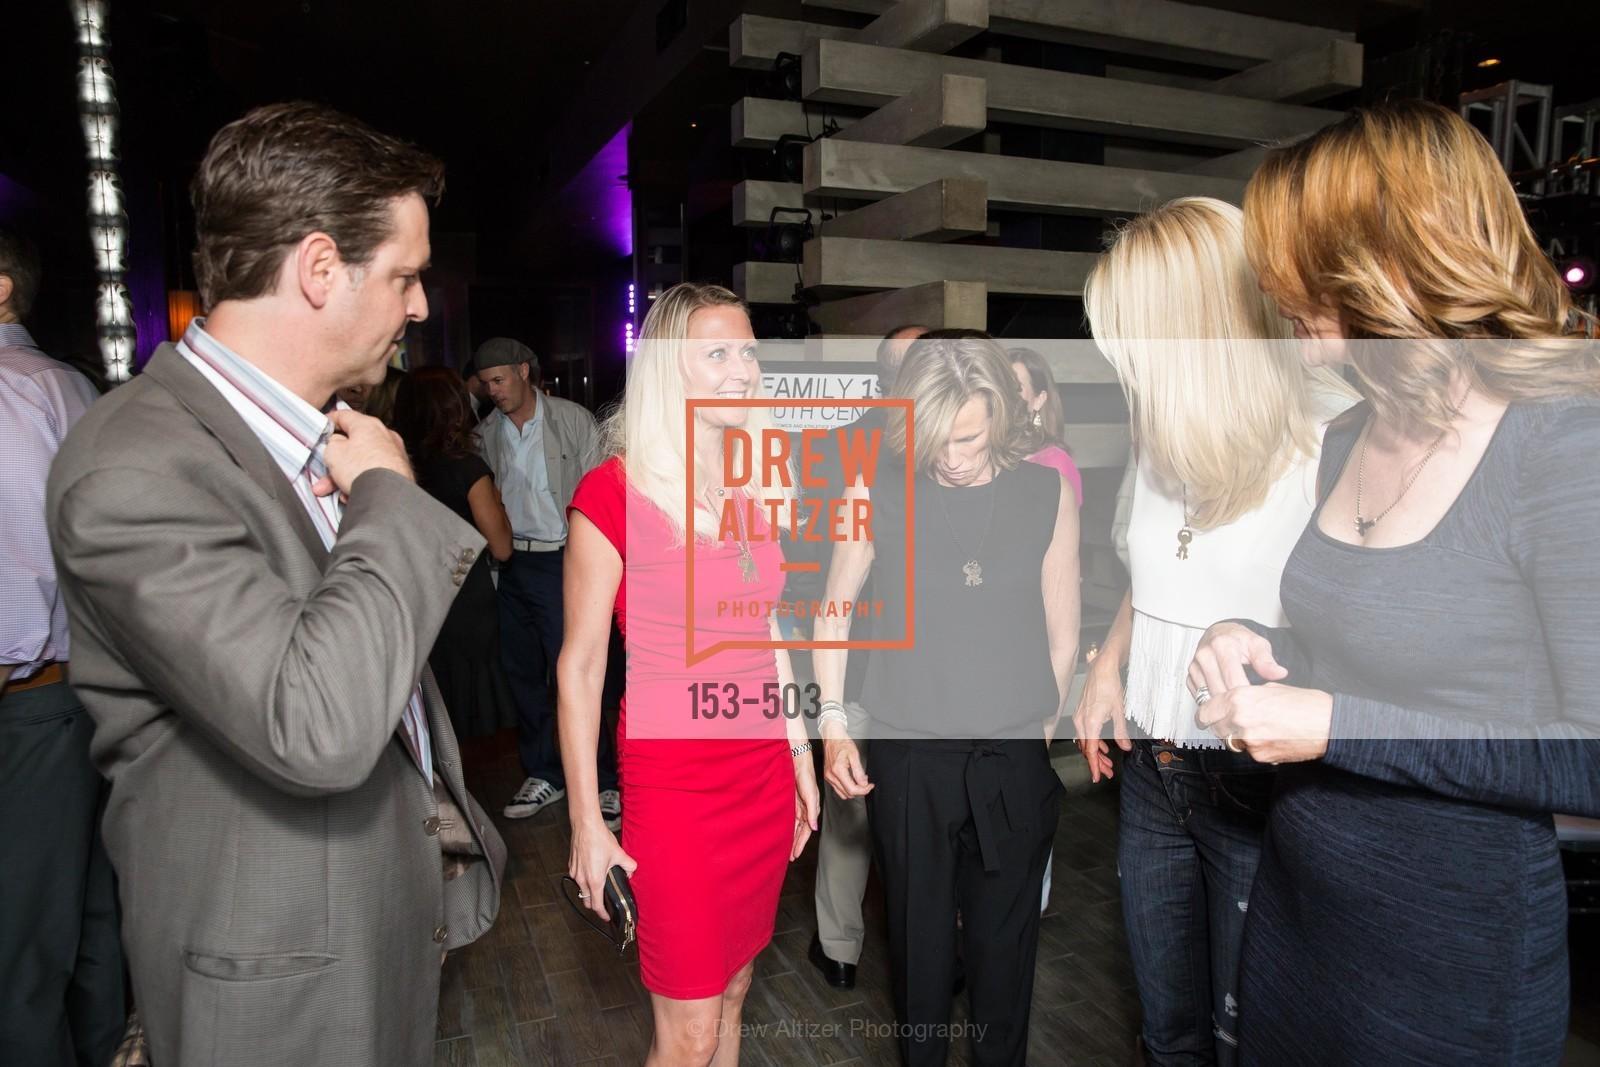 Chrissy Delisle, Julie Wallunas, NFL CELEBRITY Bartending Event, US. US, April 7th, 2014,Drew Altizer, Drew Altizer Photography, full-service agency, private events, San Francisco photographer, photographer california